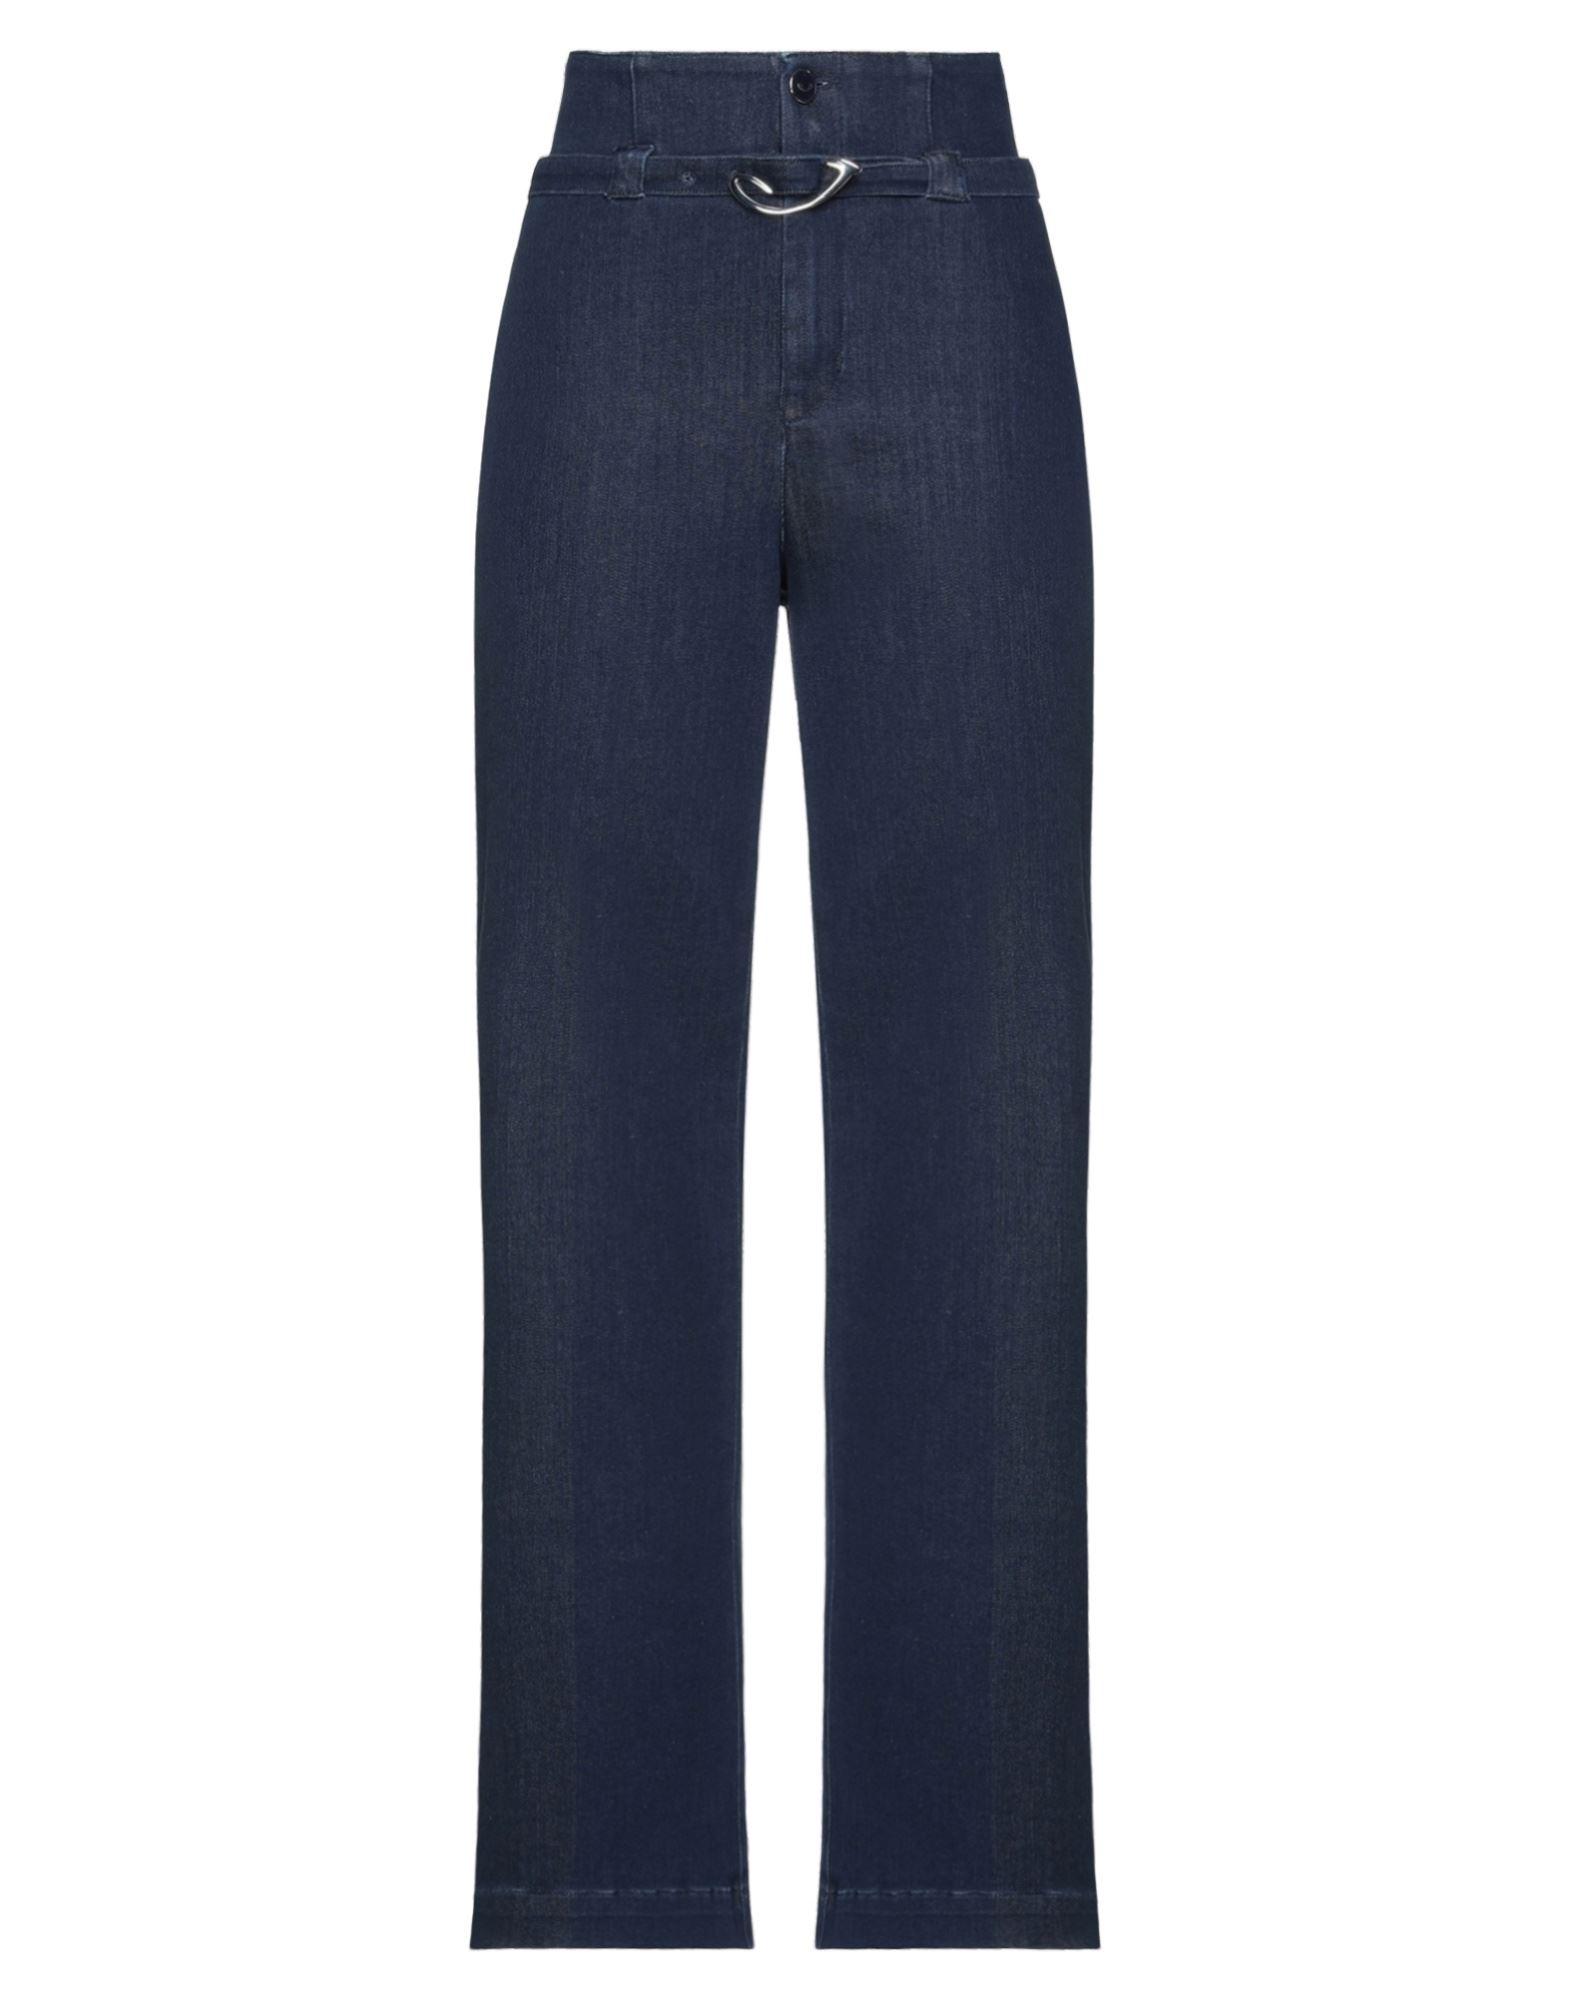 JACOB COHЁN Denim pants - Item 42843199